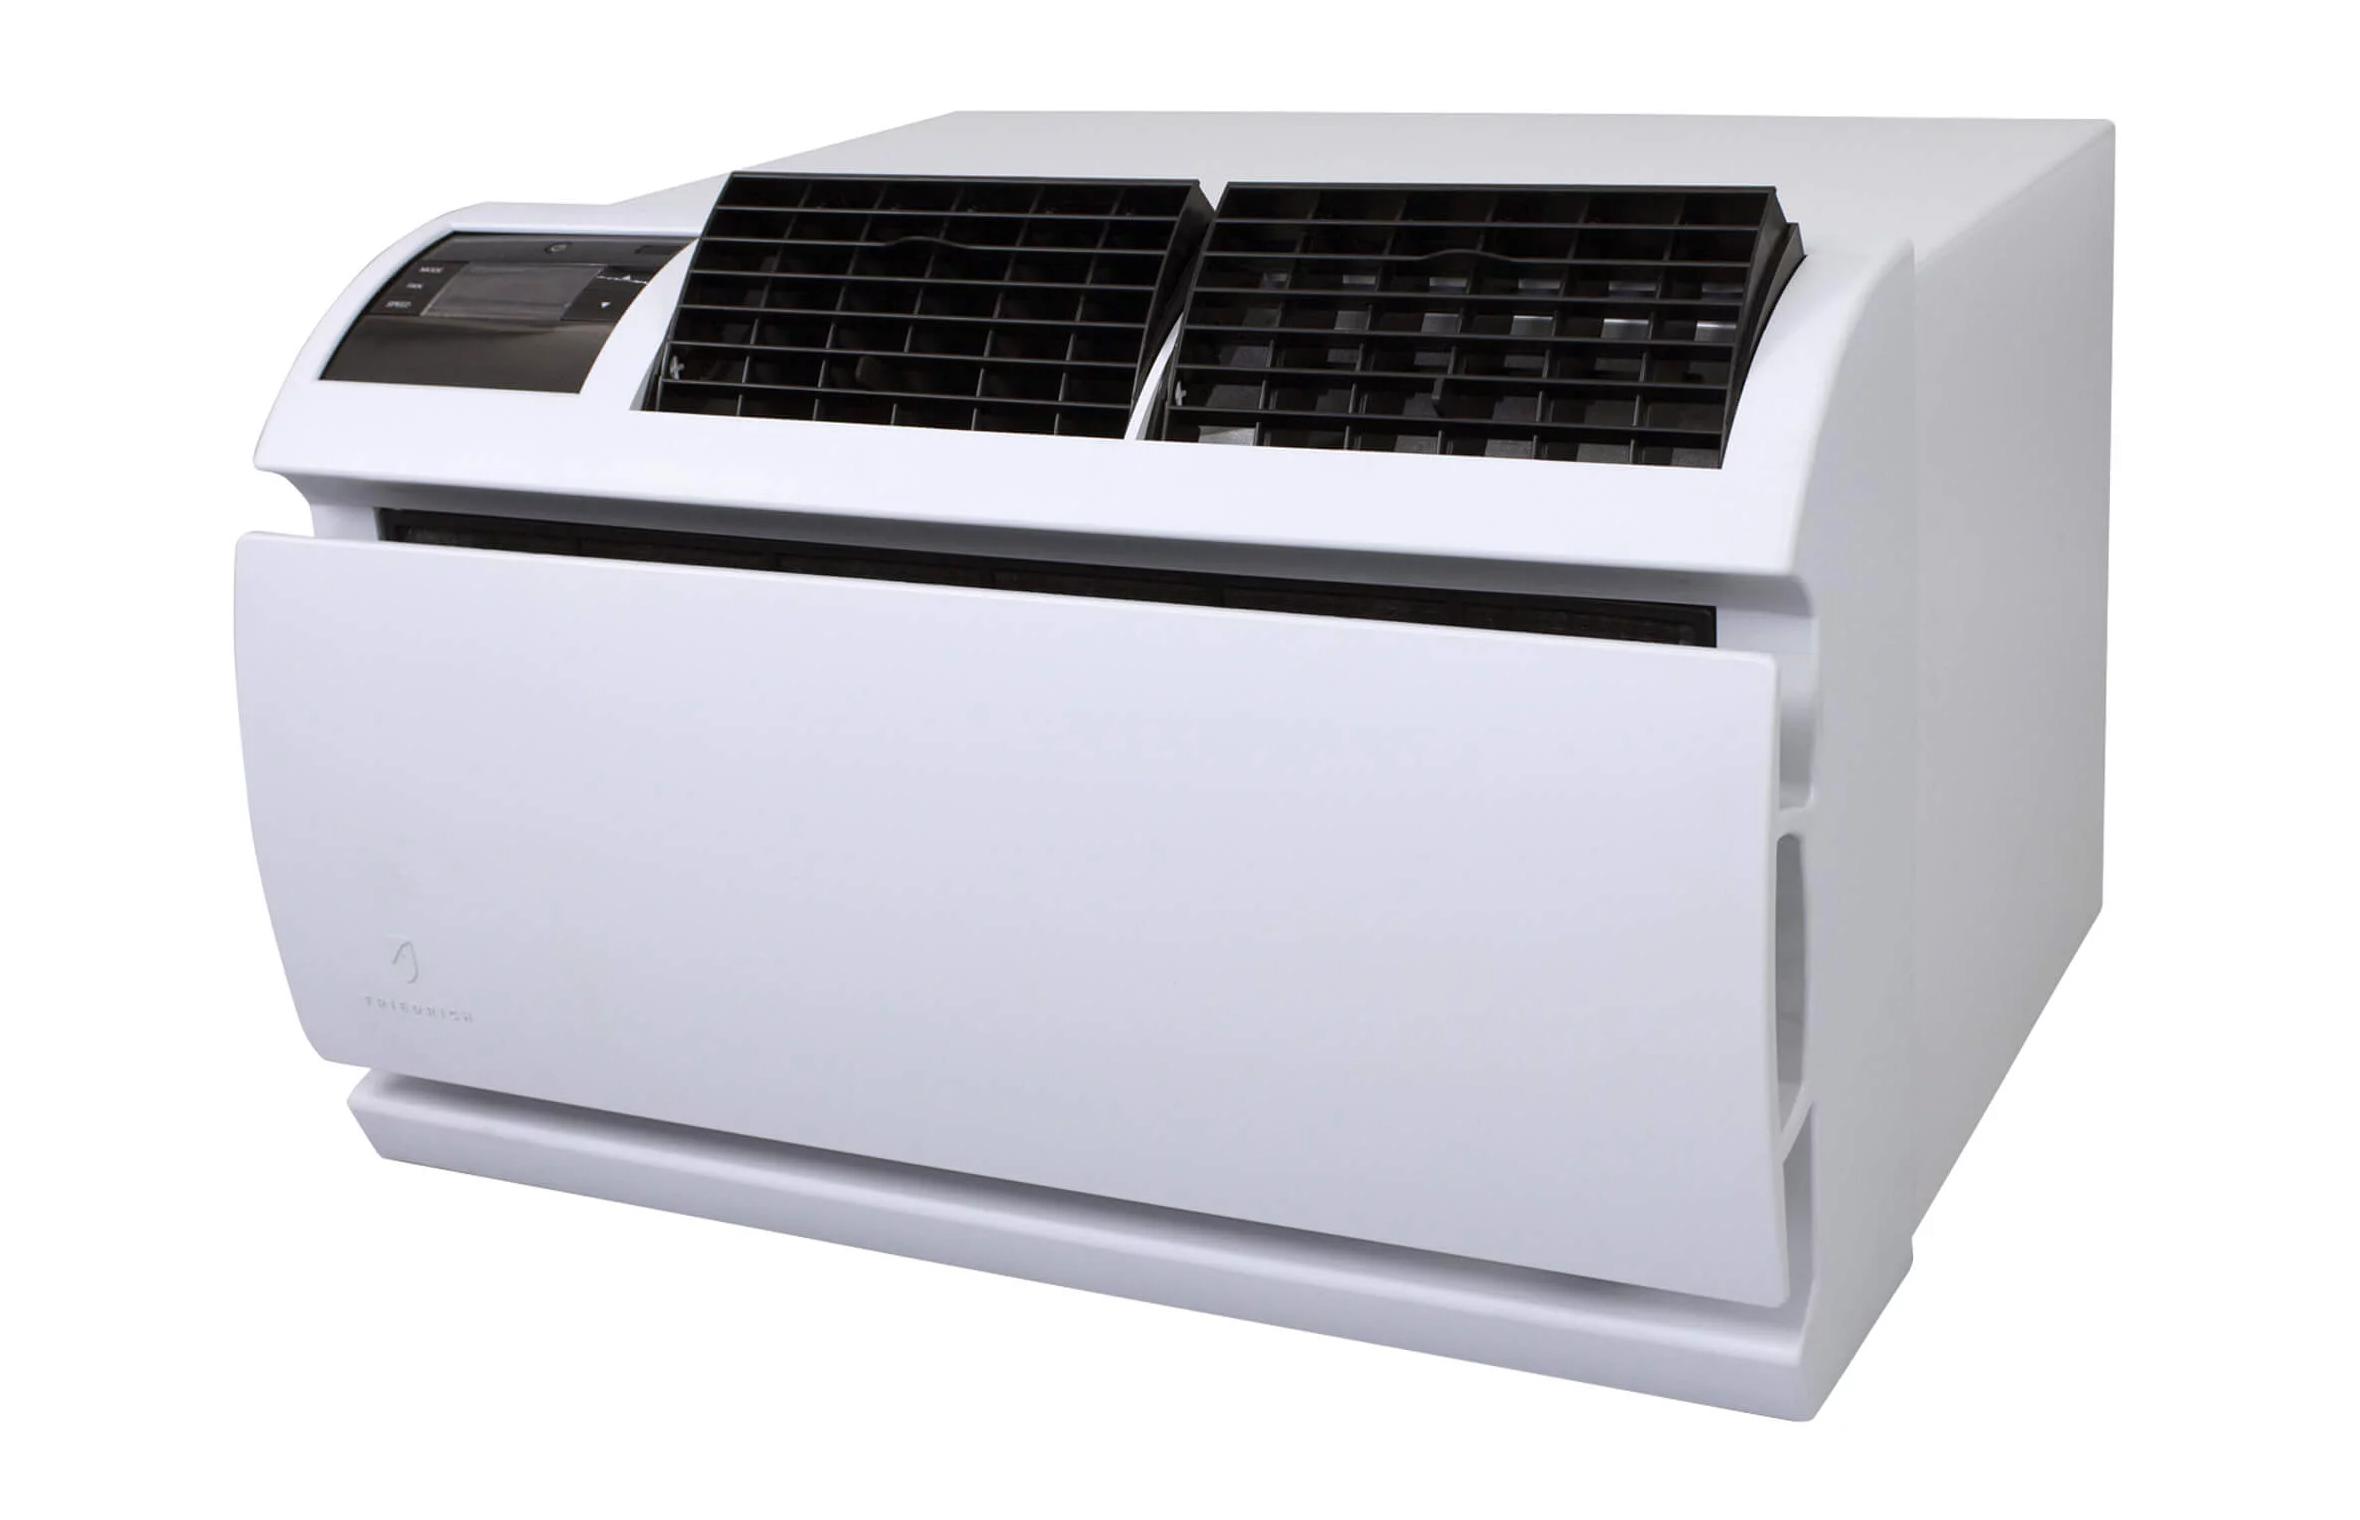 Friedrich WCT10A30A Wallmaster Series 10000 BTU Smart WiFi Through-the-Wall Air Conditioner - 208/230 Volt - Energy Star